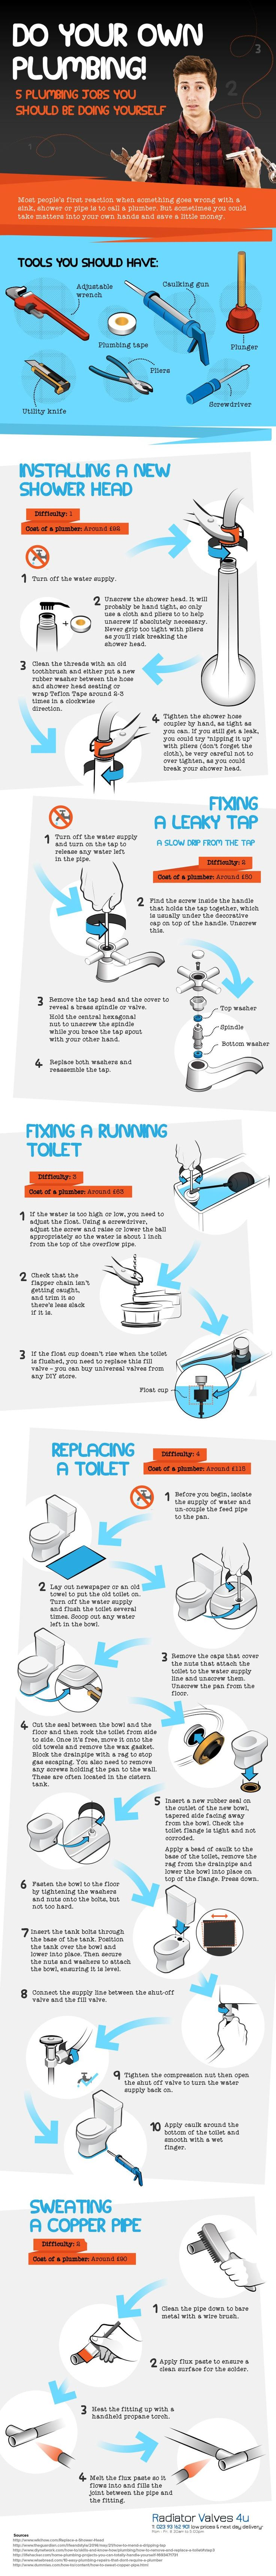 Plumbing Hacks by Radiator Valves 4u